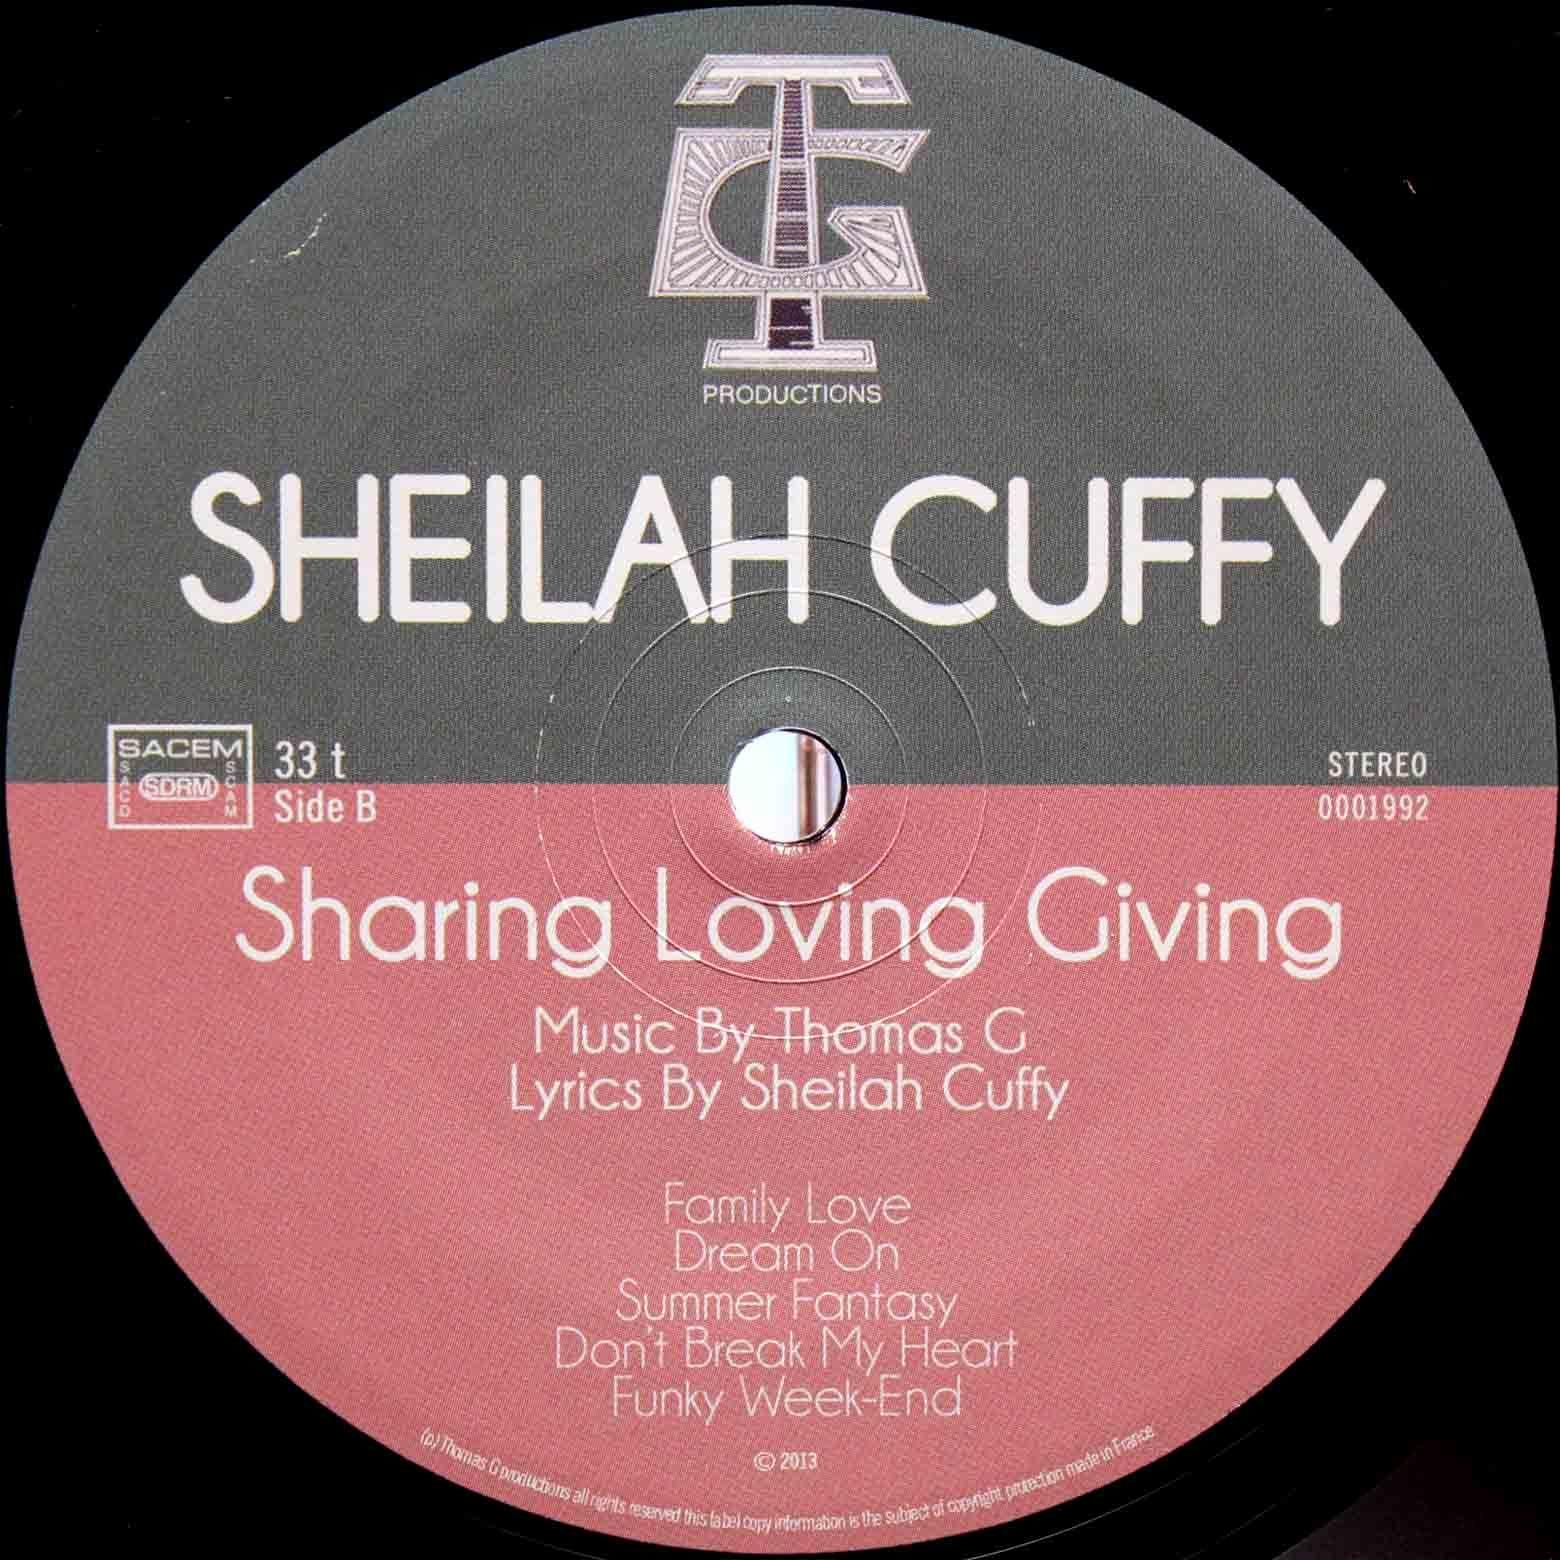 Thomas G Sheilah Cuffy – Sharing Loving Giving 05